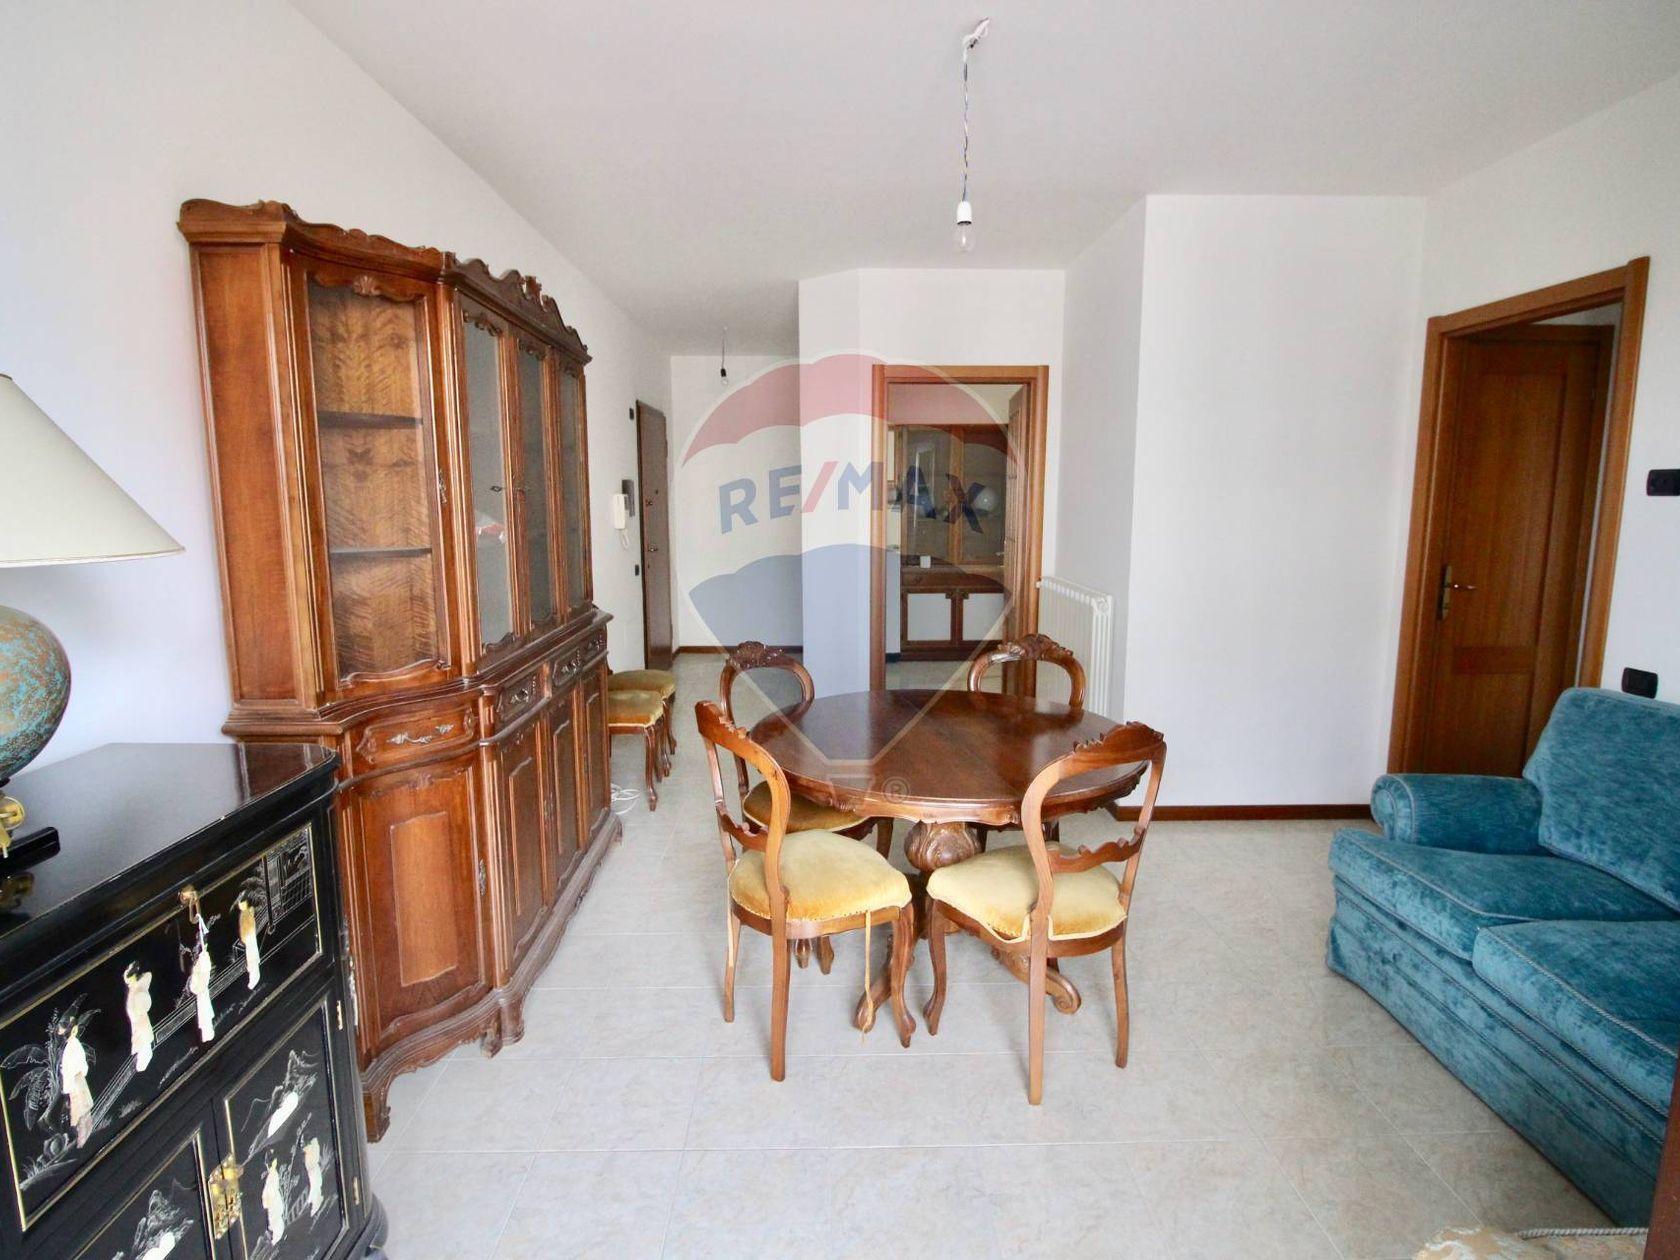 Appartamento Ss-s. Orsola Storica, Sassari, SS Vendita - Foto 6